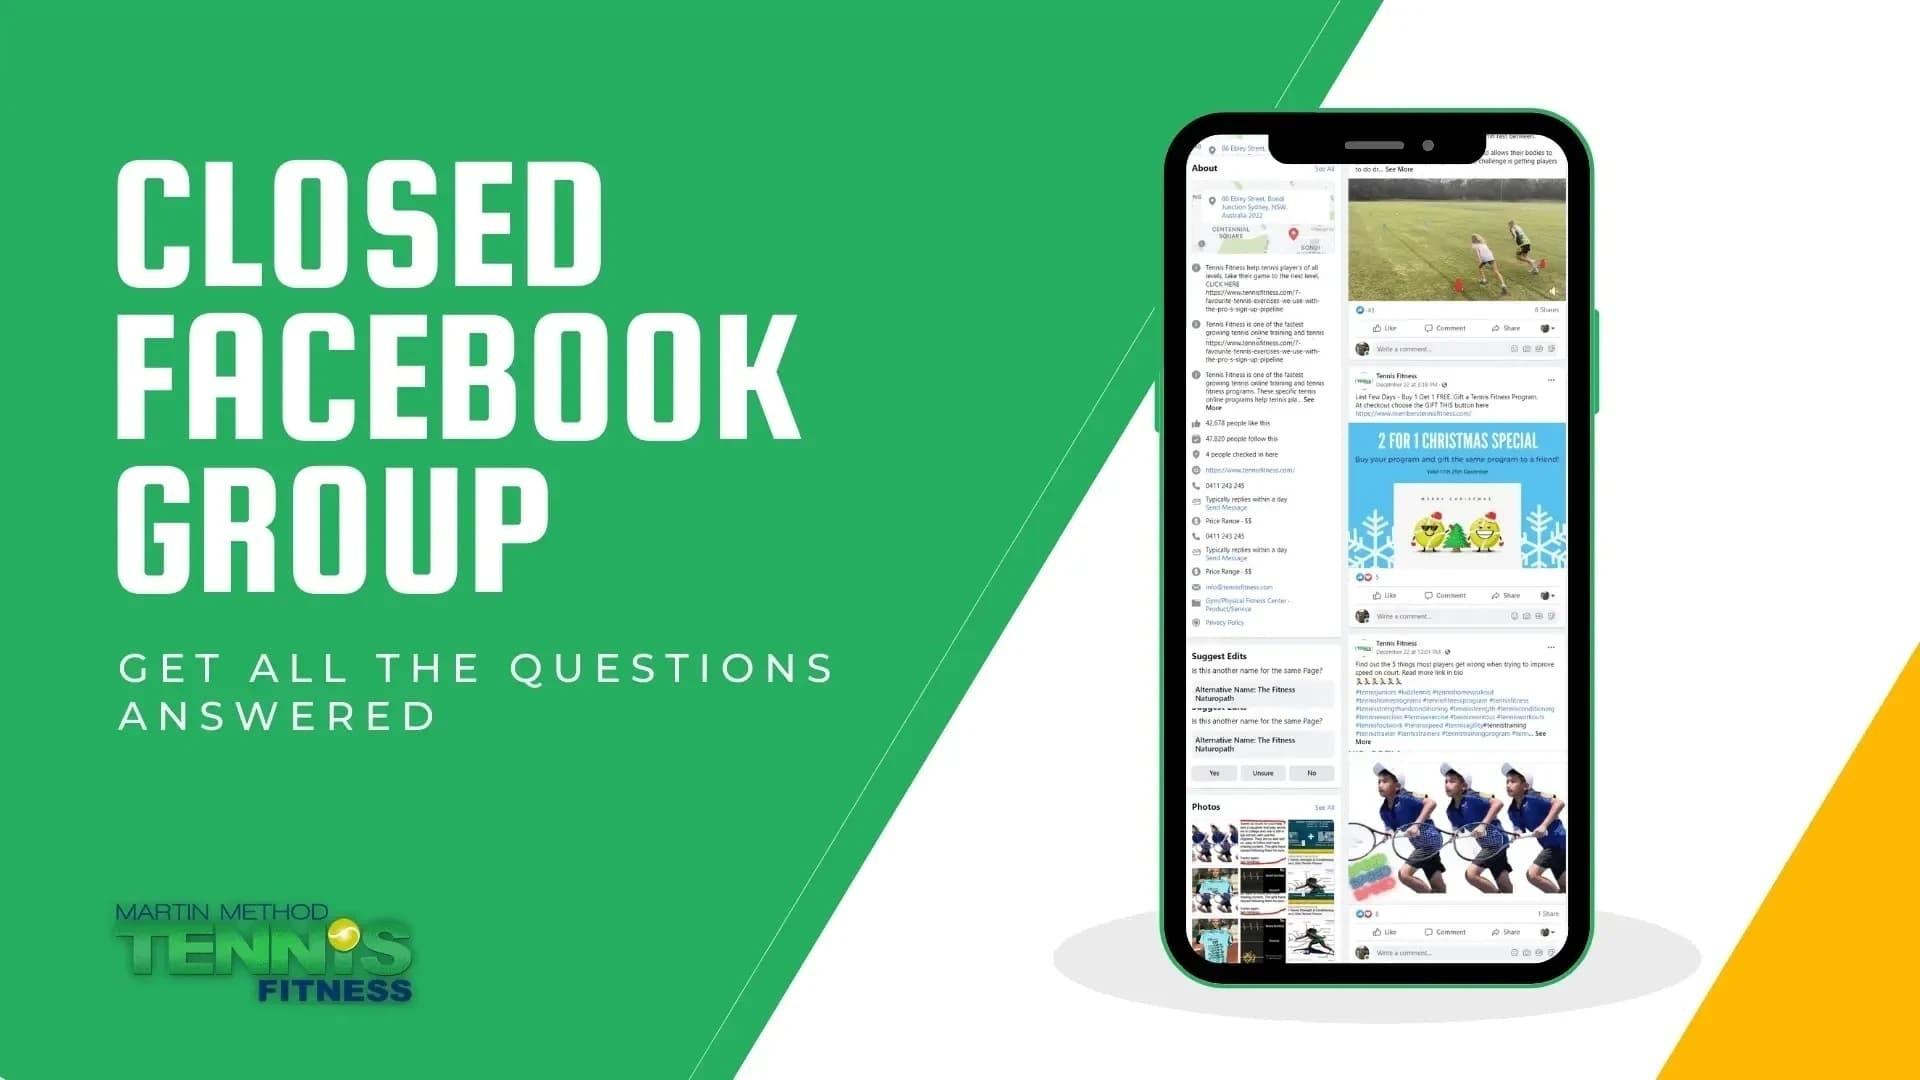 tennis-facebook-group